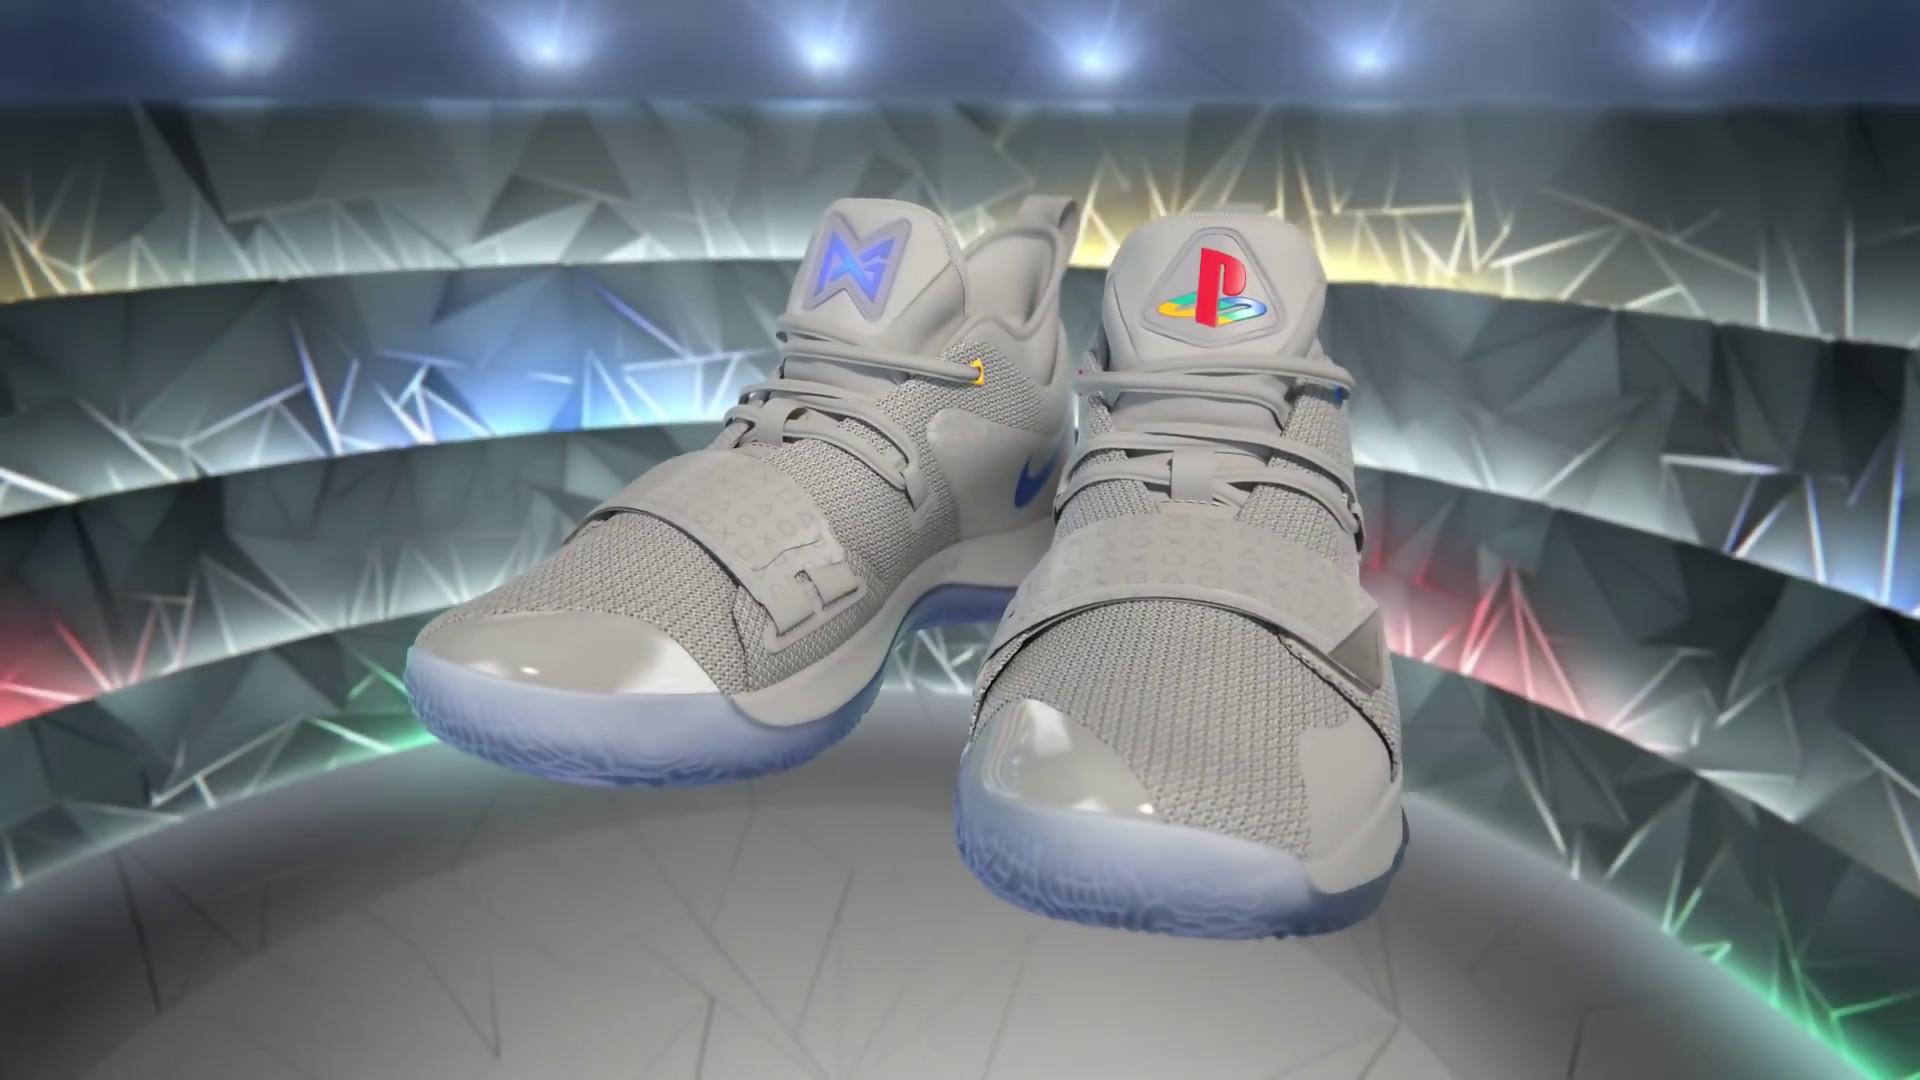 d03b72d8b38 PlayStation   Sony dévoile les Nike PG 2.5